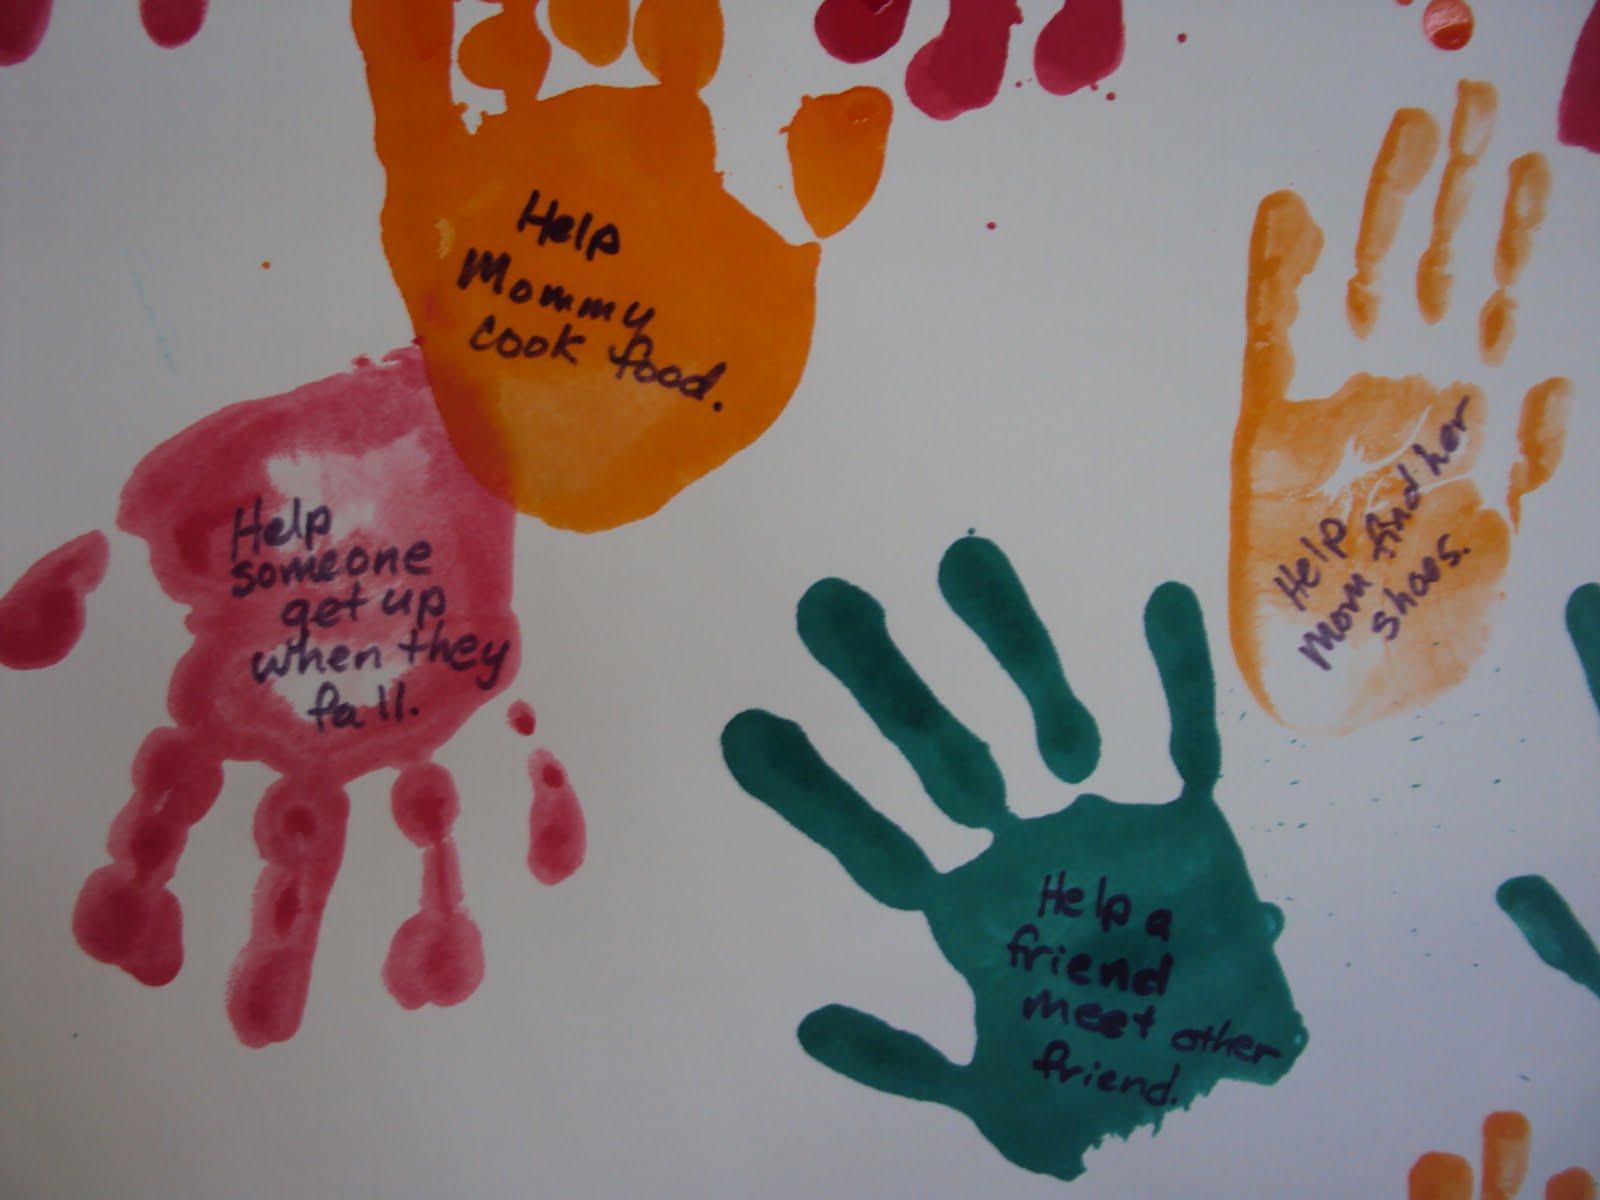 Good samaritan sunday school craft - Handprints Helping Hands Craft Addition From The Good Samaritan